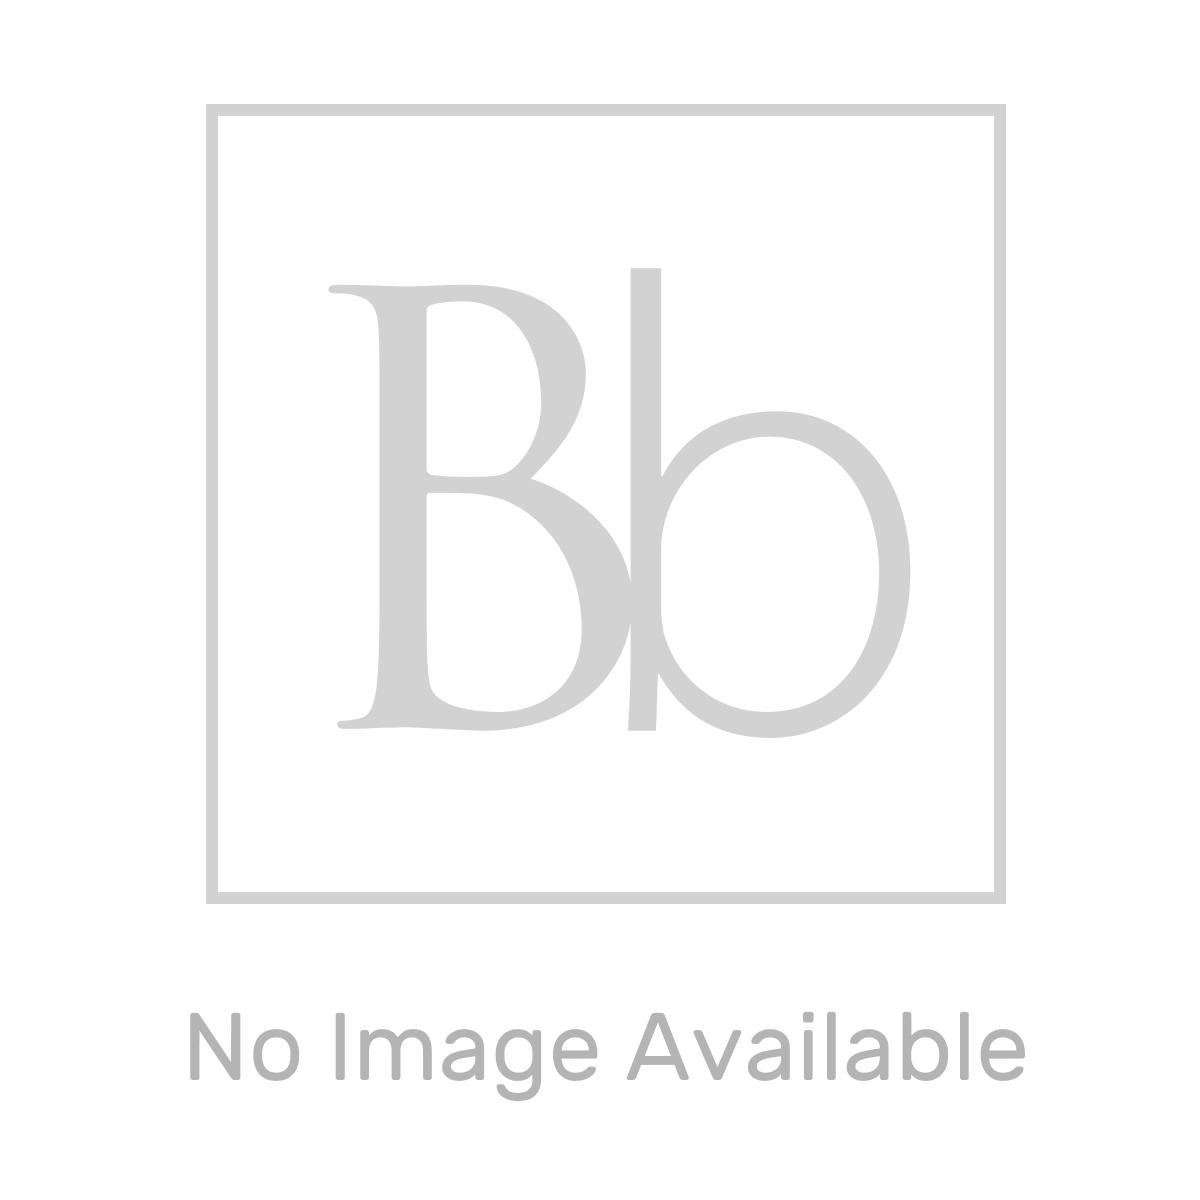 Bathrooms To Love Vema Tamesis Chrome Hose and Riser Rail Kit with Handset